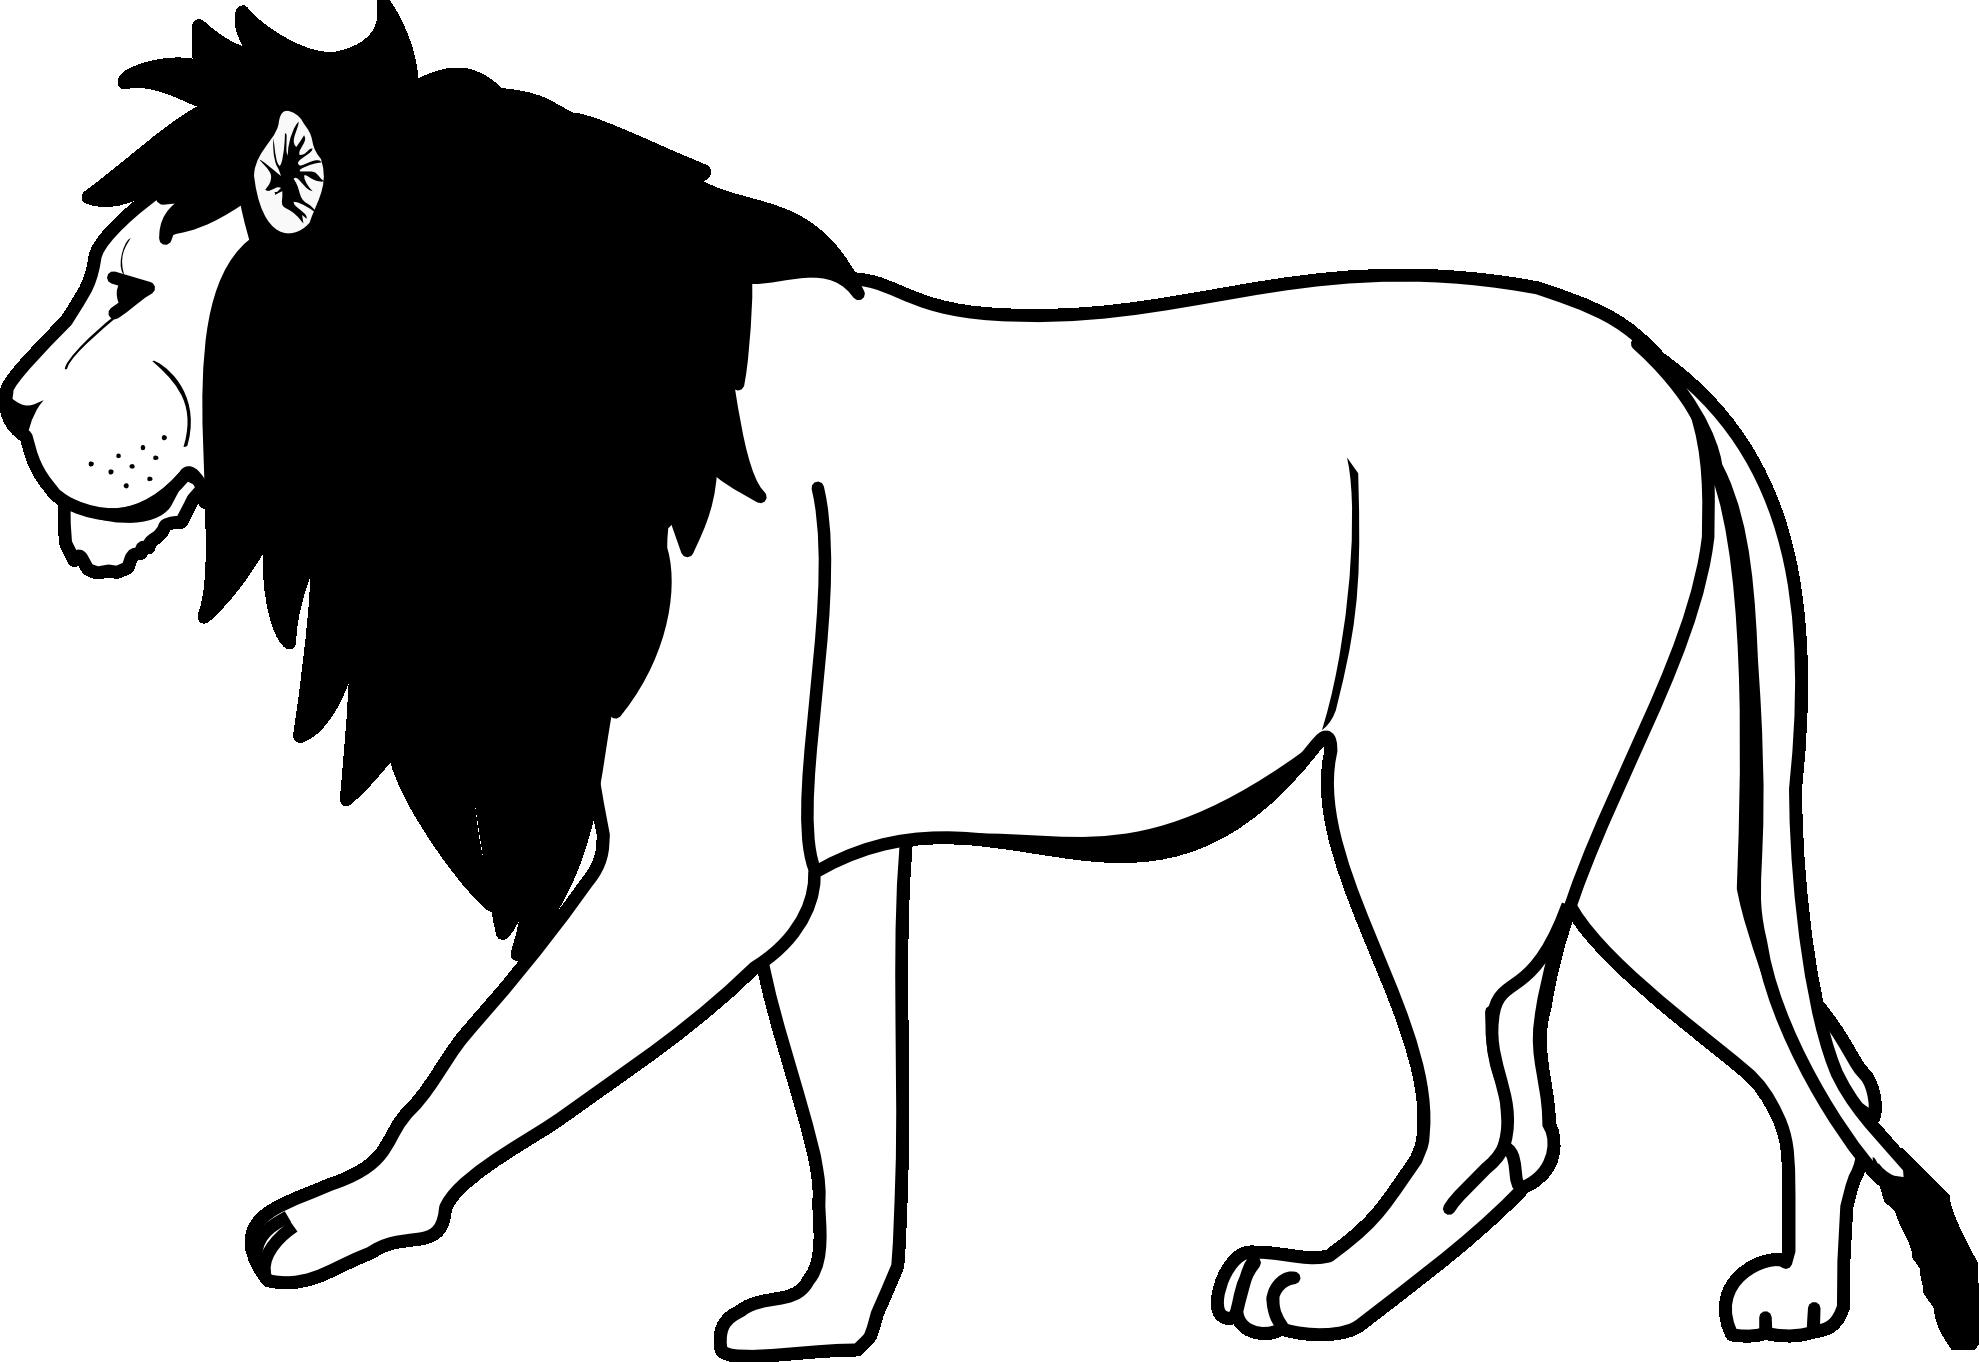 Lion Black And White Lion .-Lion black and white lion .-9